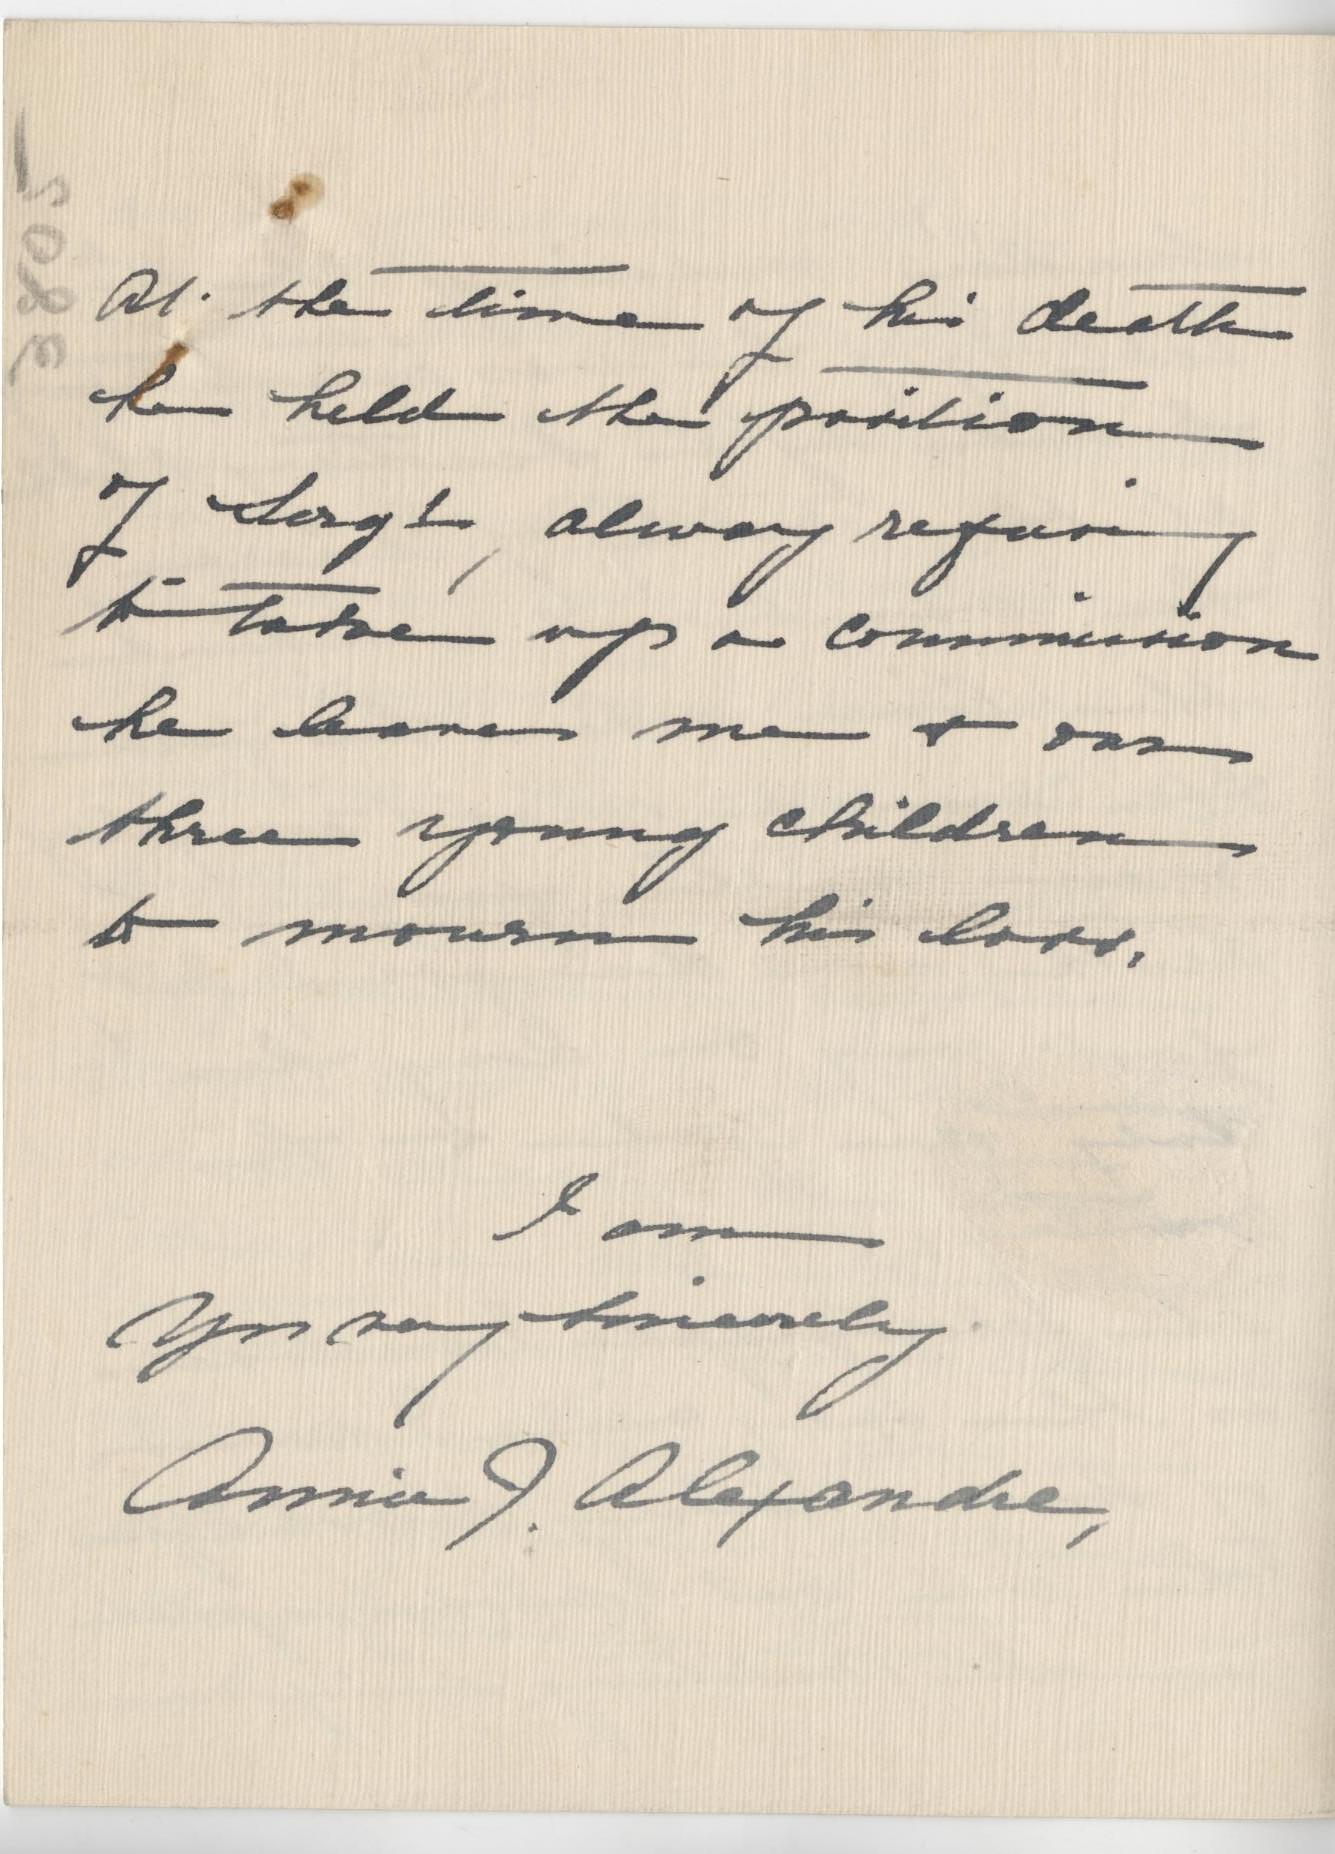 Alexandre JW Second Widow Letter 3